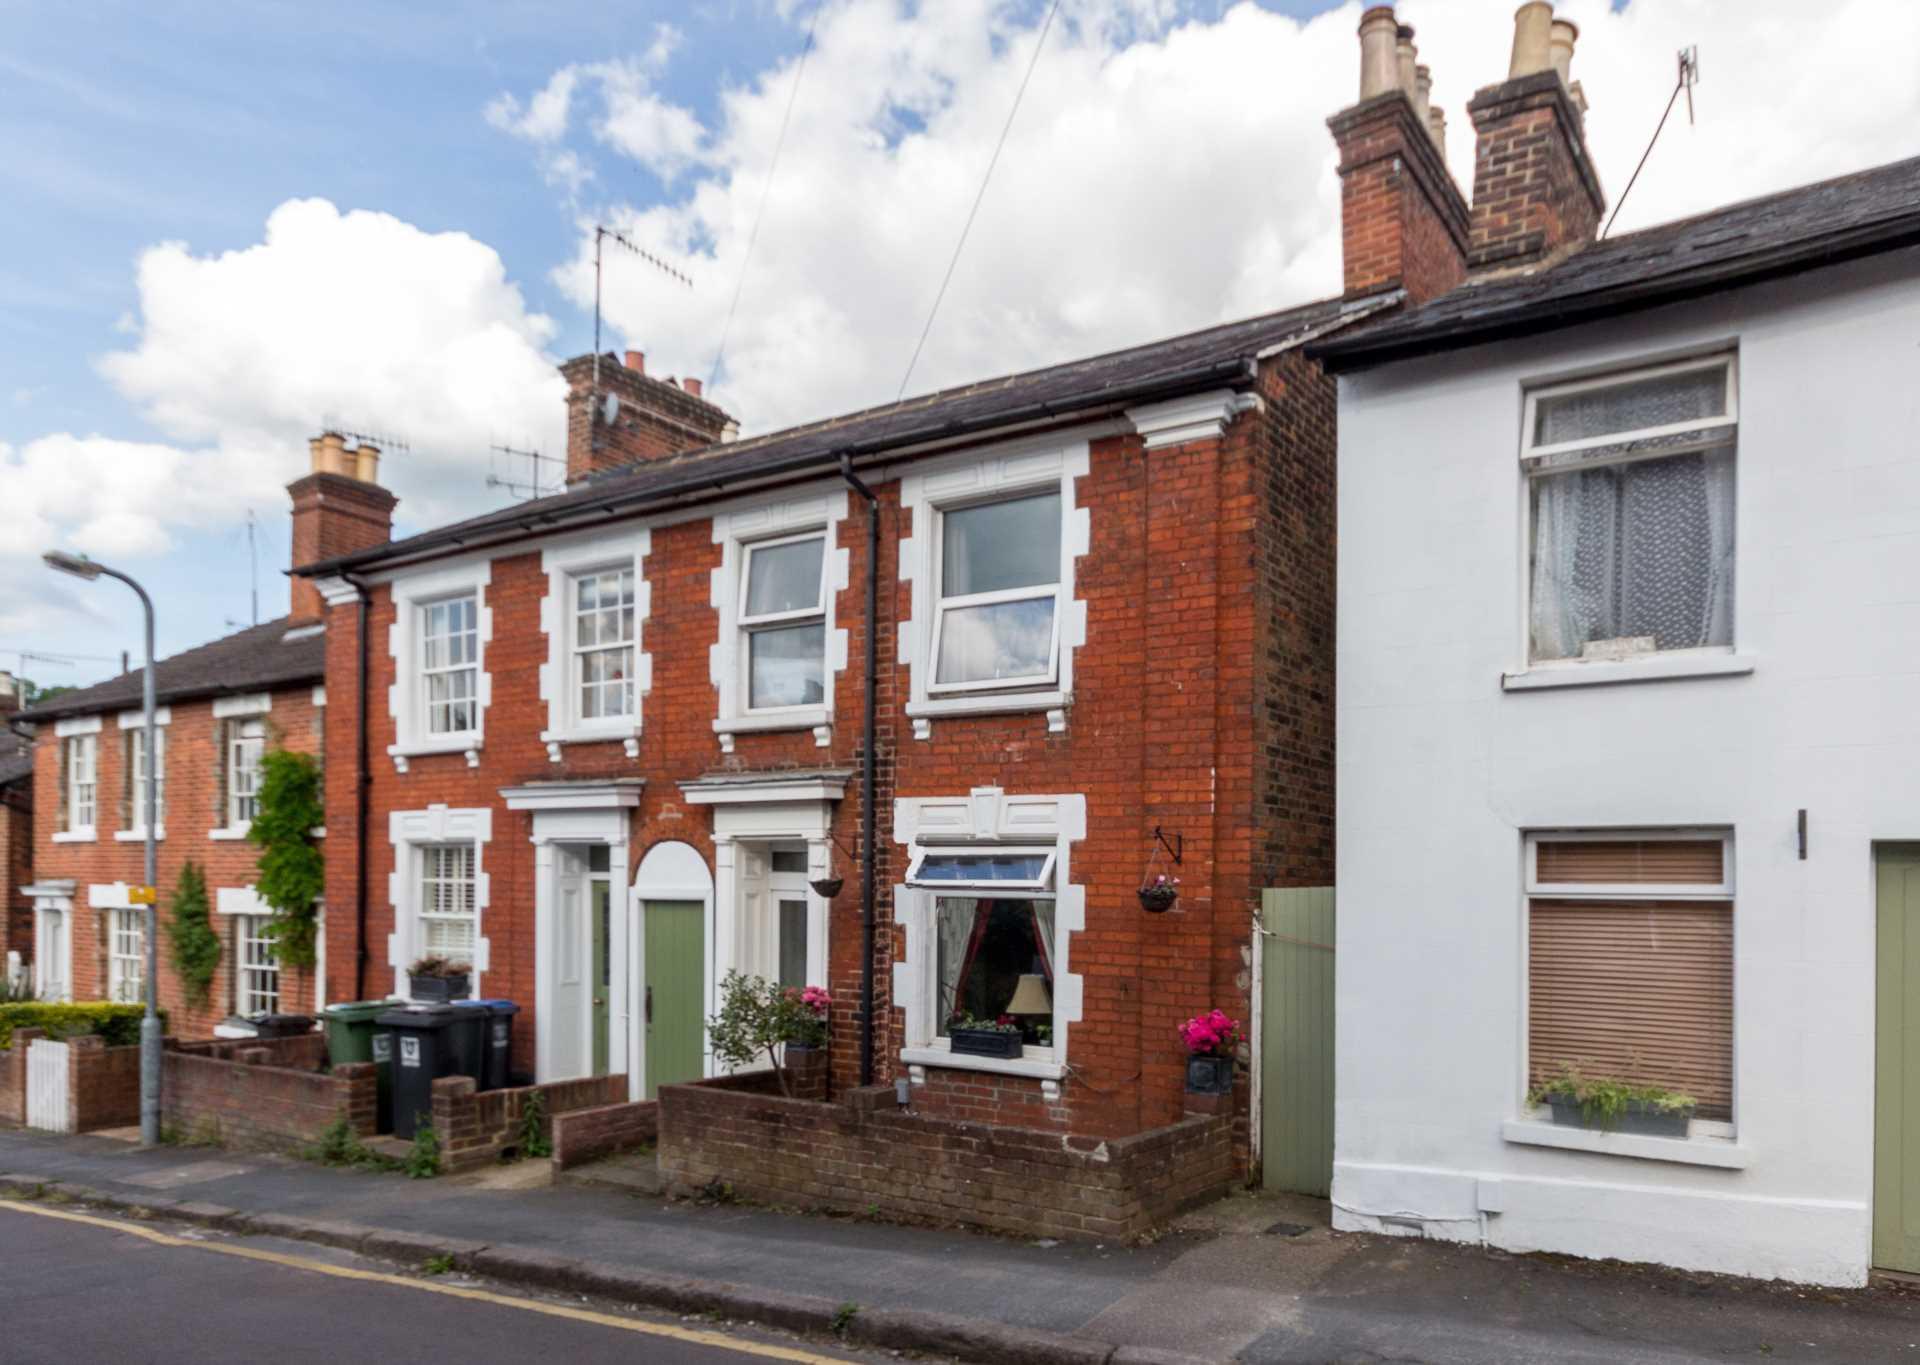 Holliday Street, Berkhamsted, Image 1